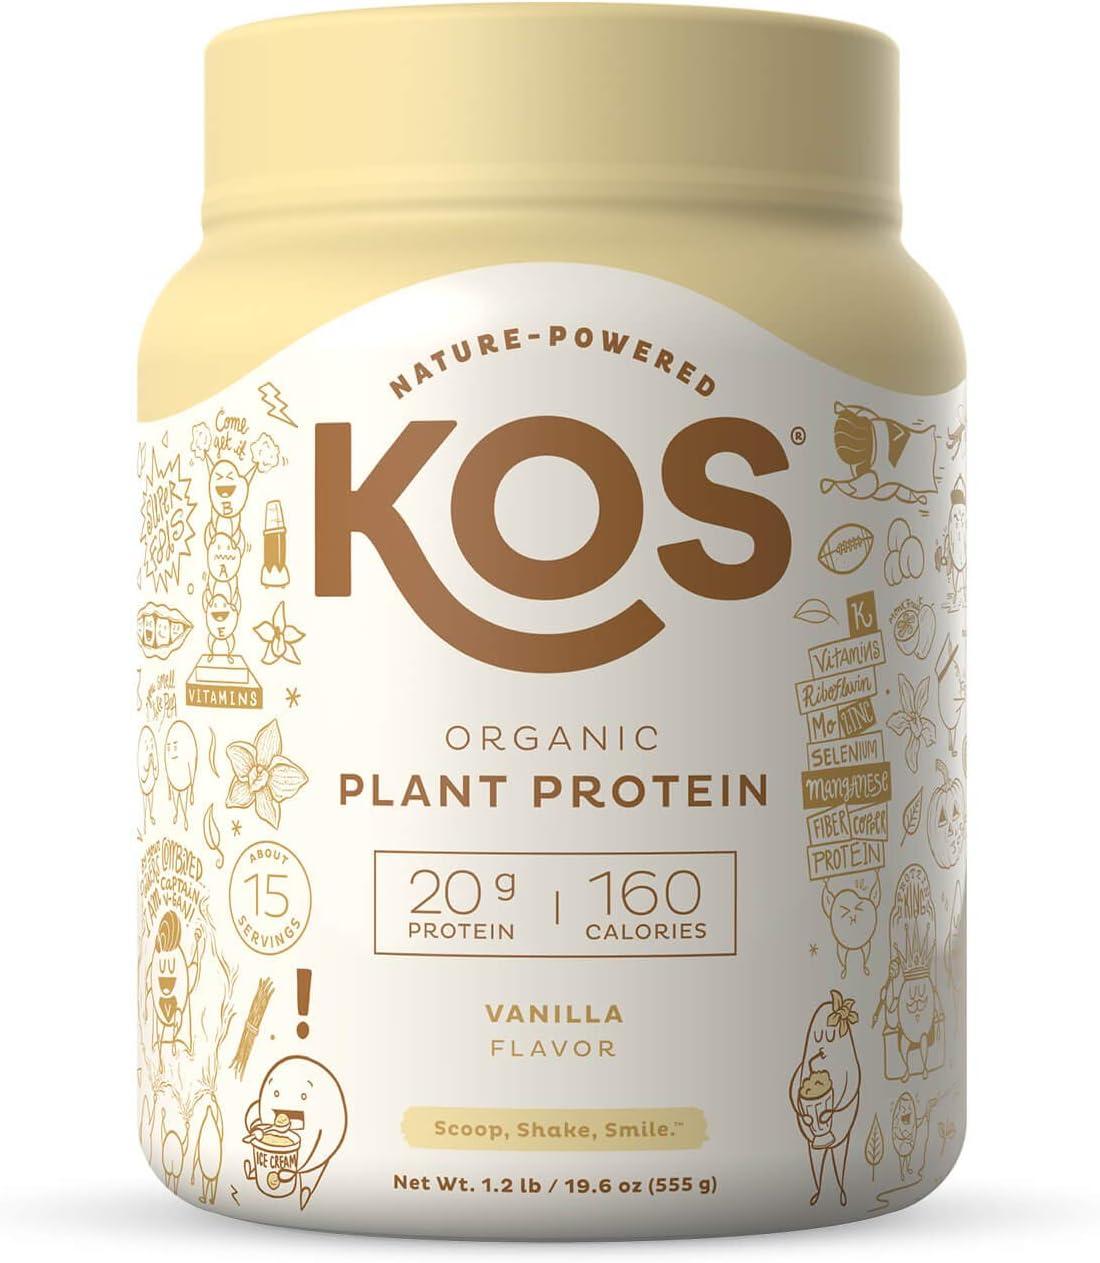 KOS Organic Plant Based Protein Powder, Vanilla - Delicious Vegan Protein Powder - Keto Friendly, Gluten Free, Dairy Free and Soy Free - 1.2 Pounds, 15 Servings